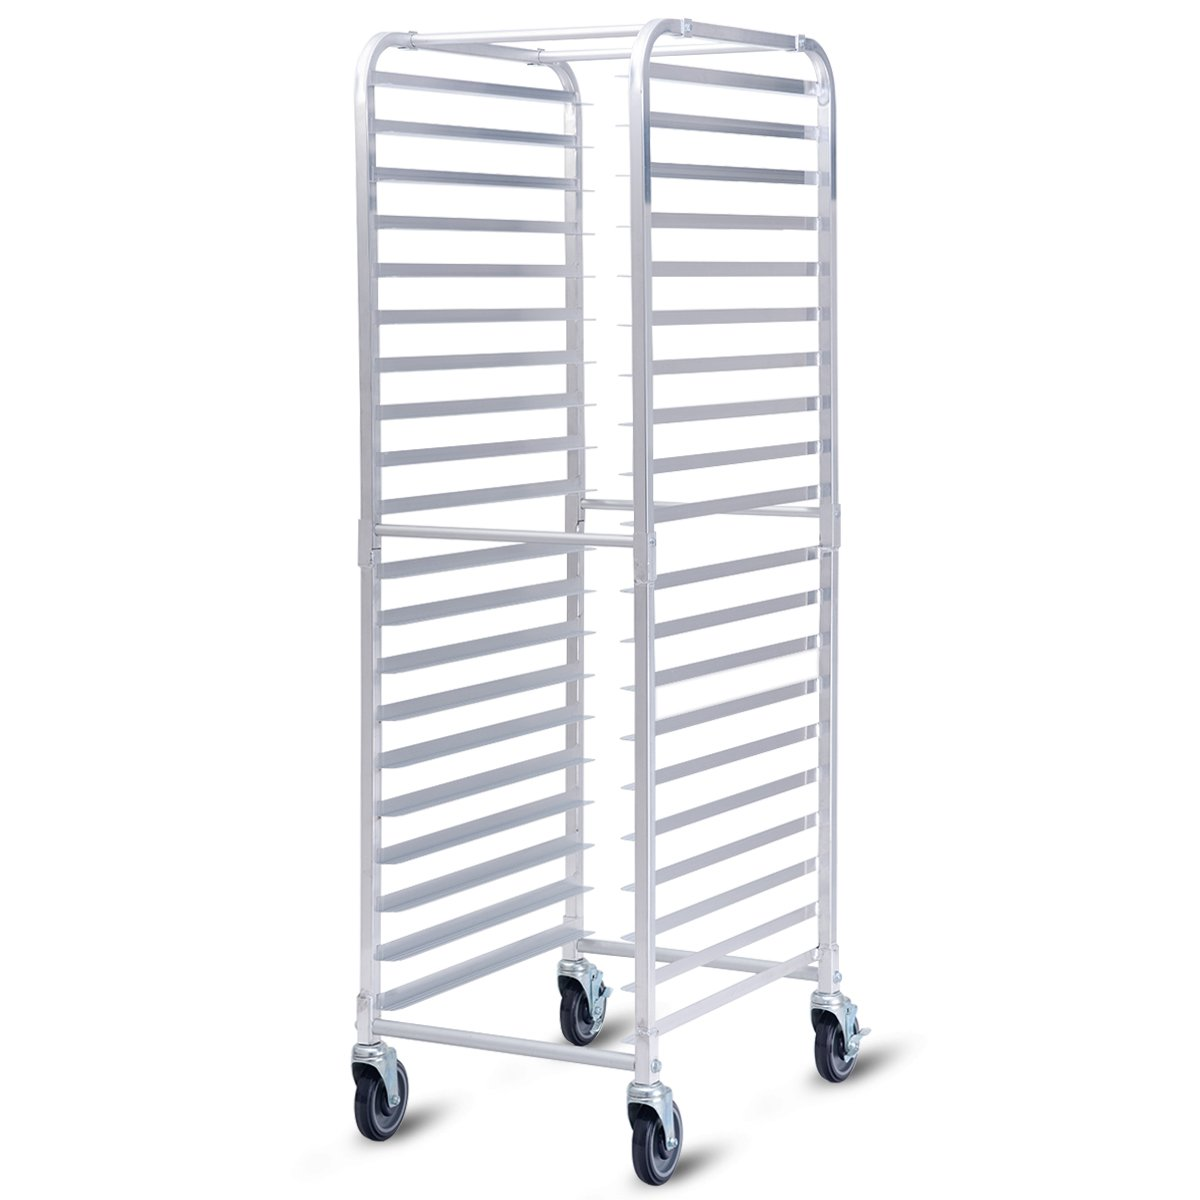 CHEFJOY 33856DPT-LT Sheet racks, 20, Silver by CHEFJOY